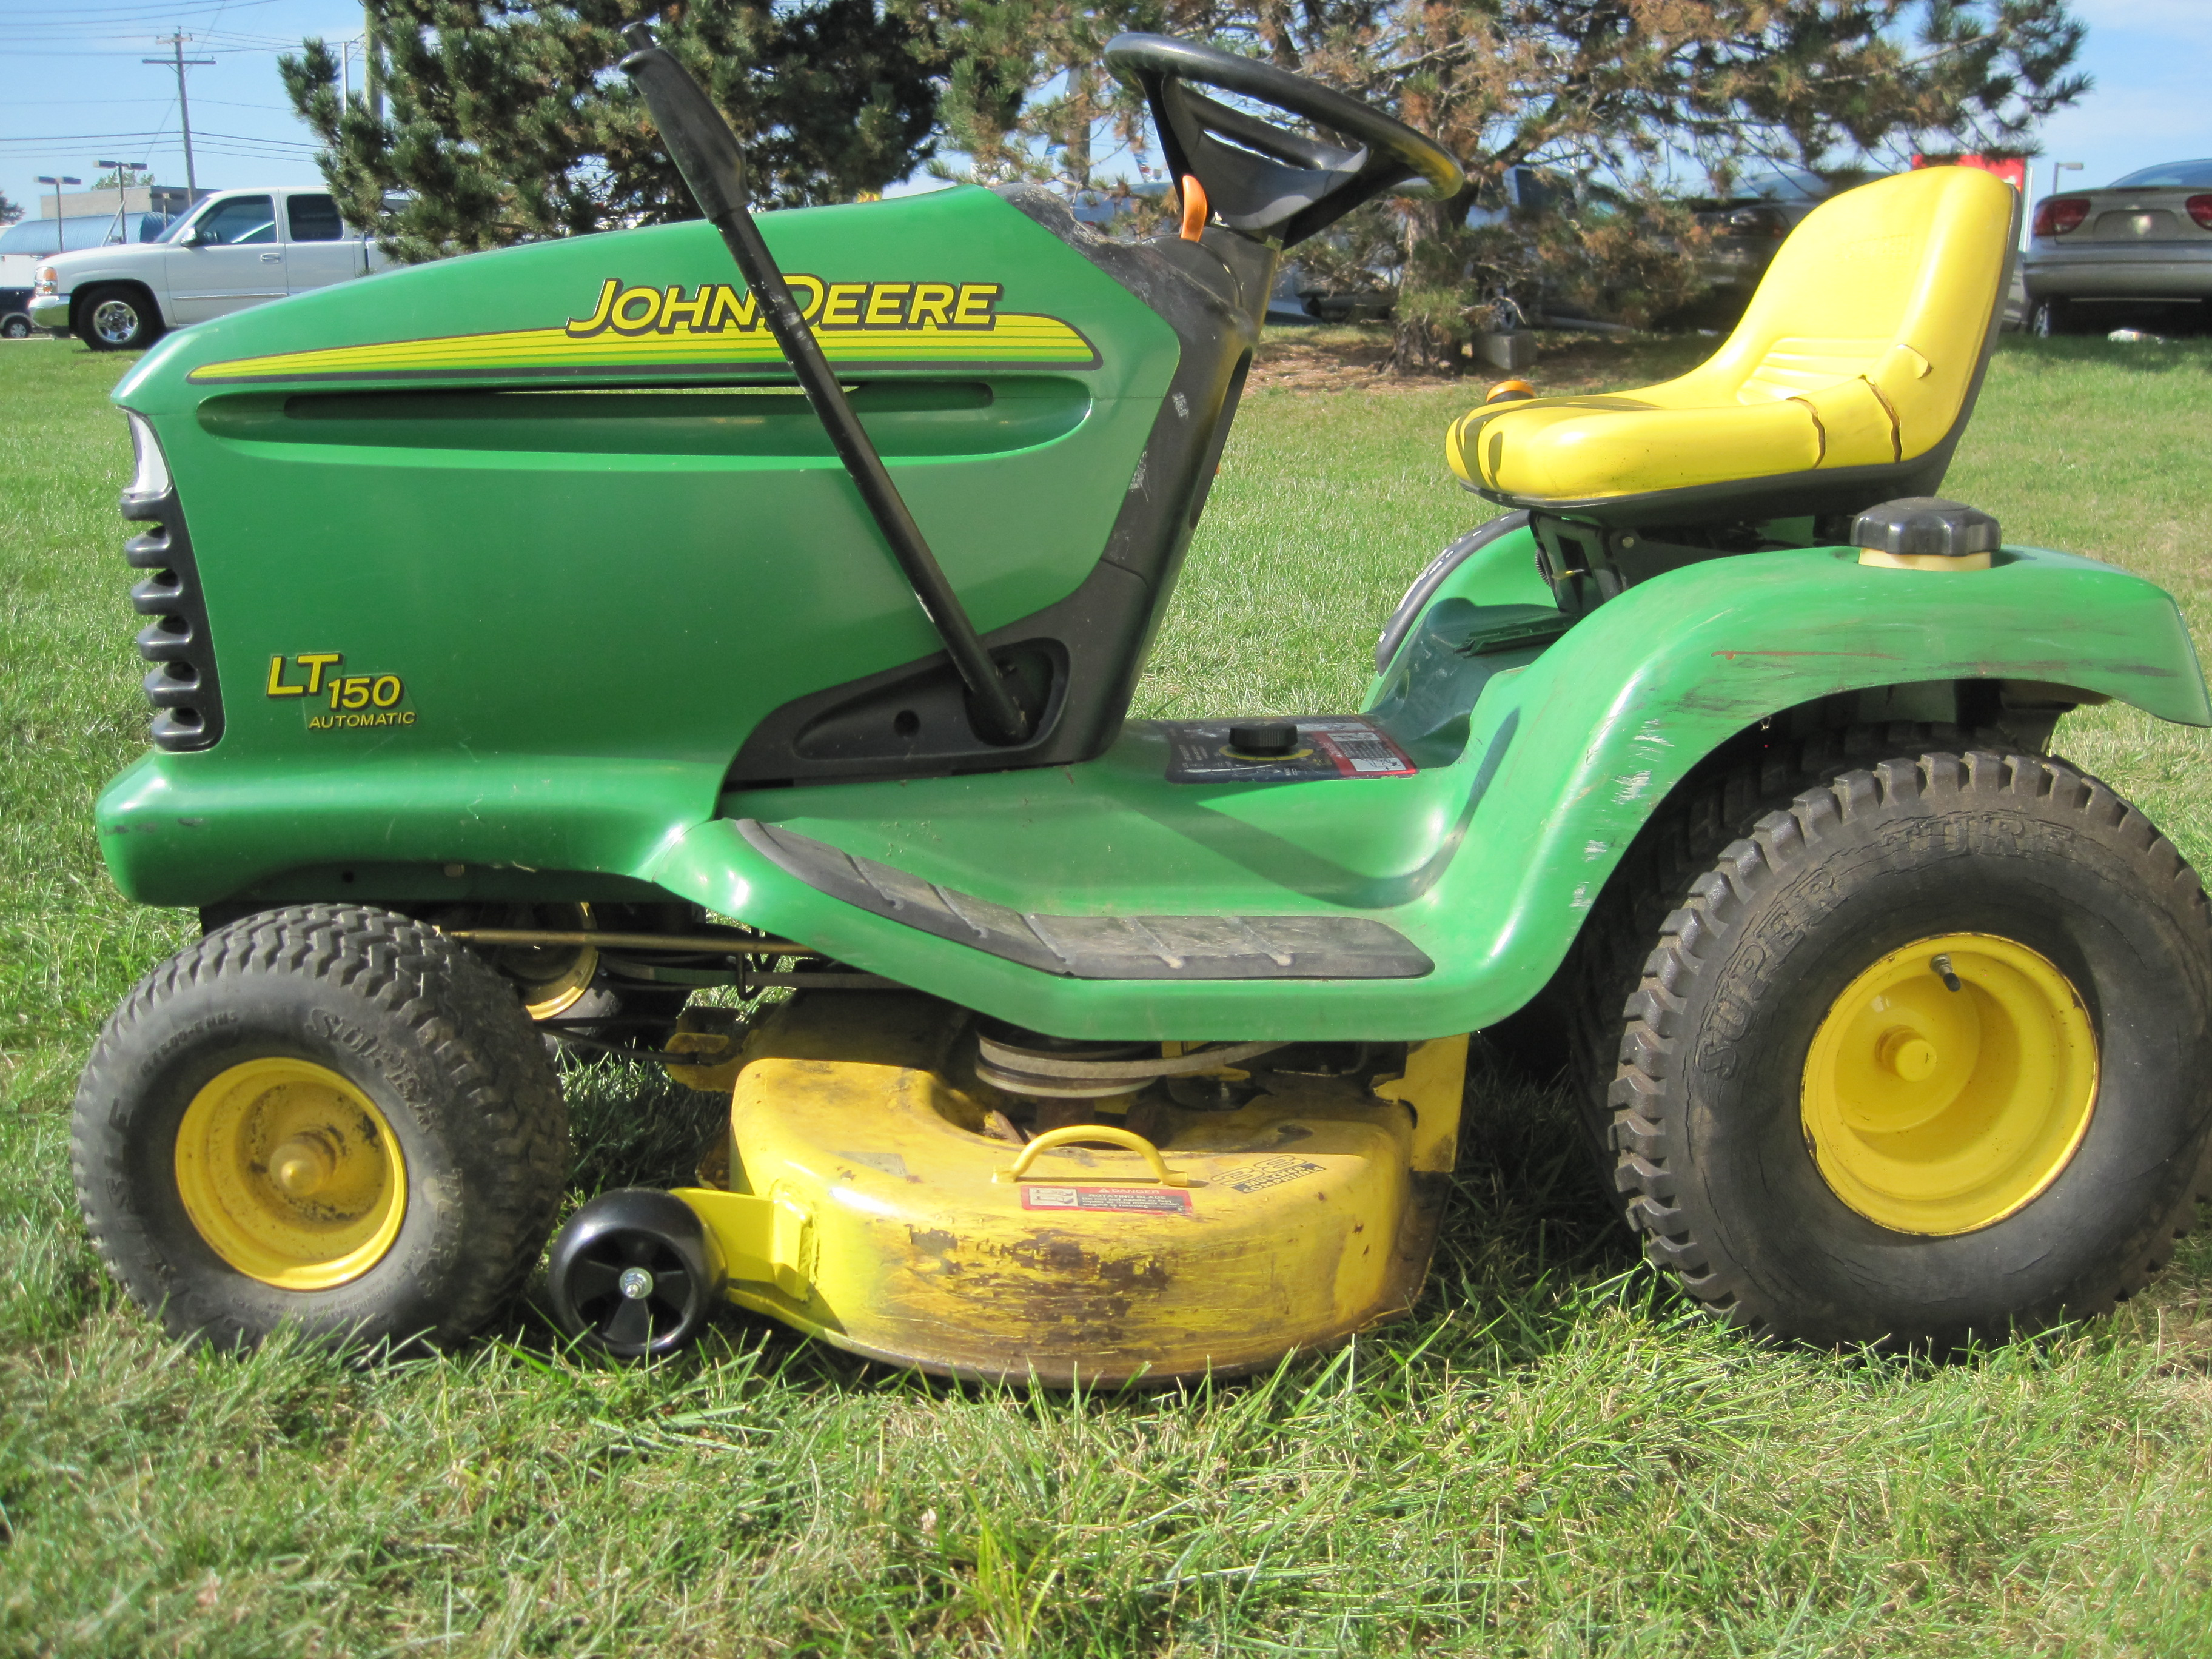 John Deere Lt150: John Deere 150 - e-cighq.com